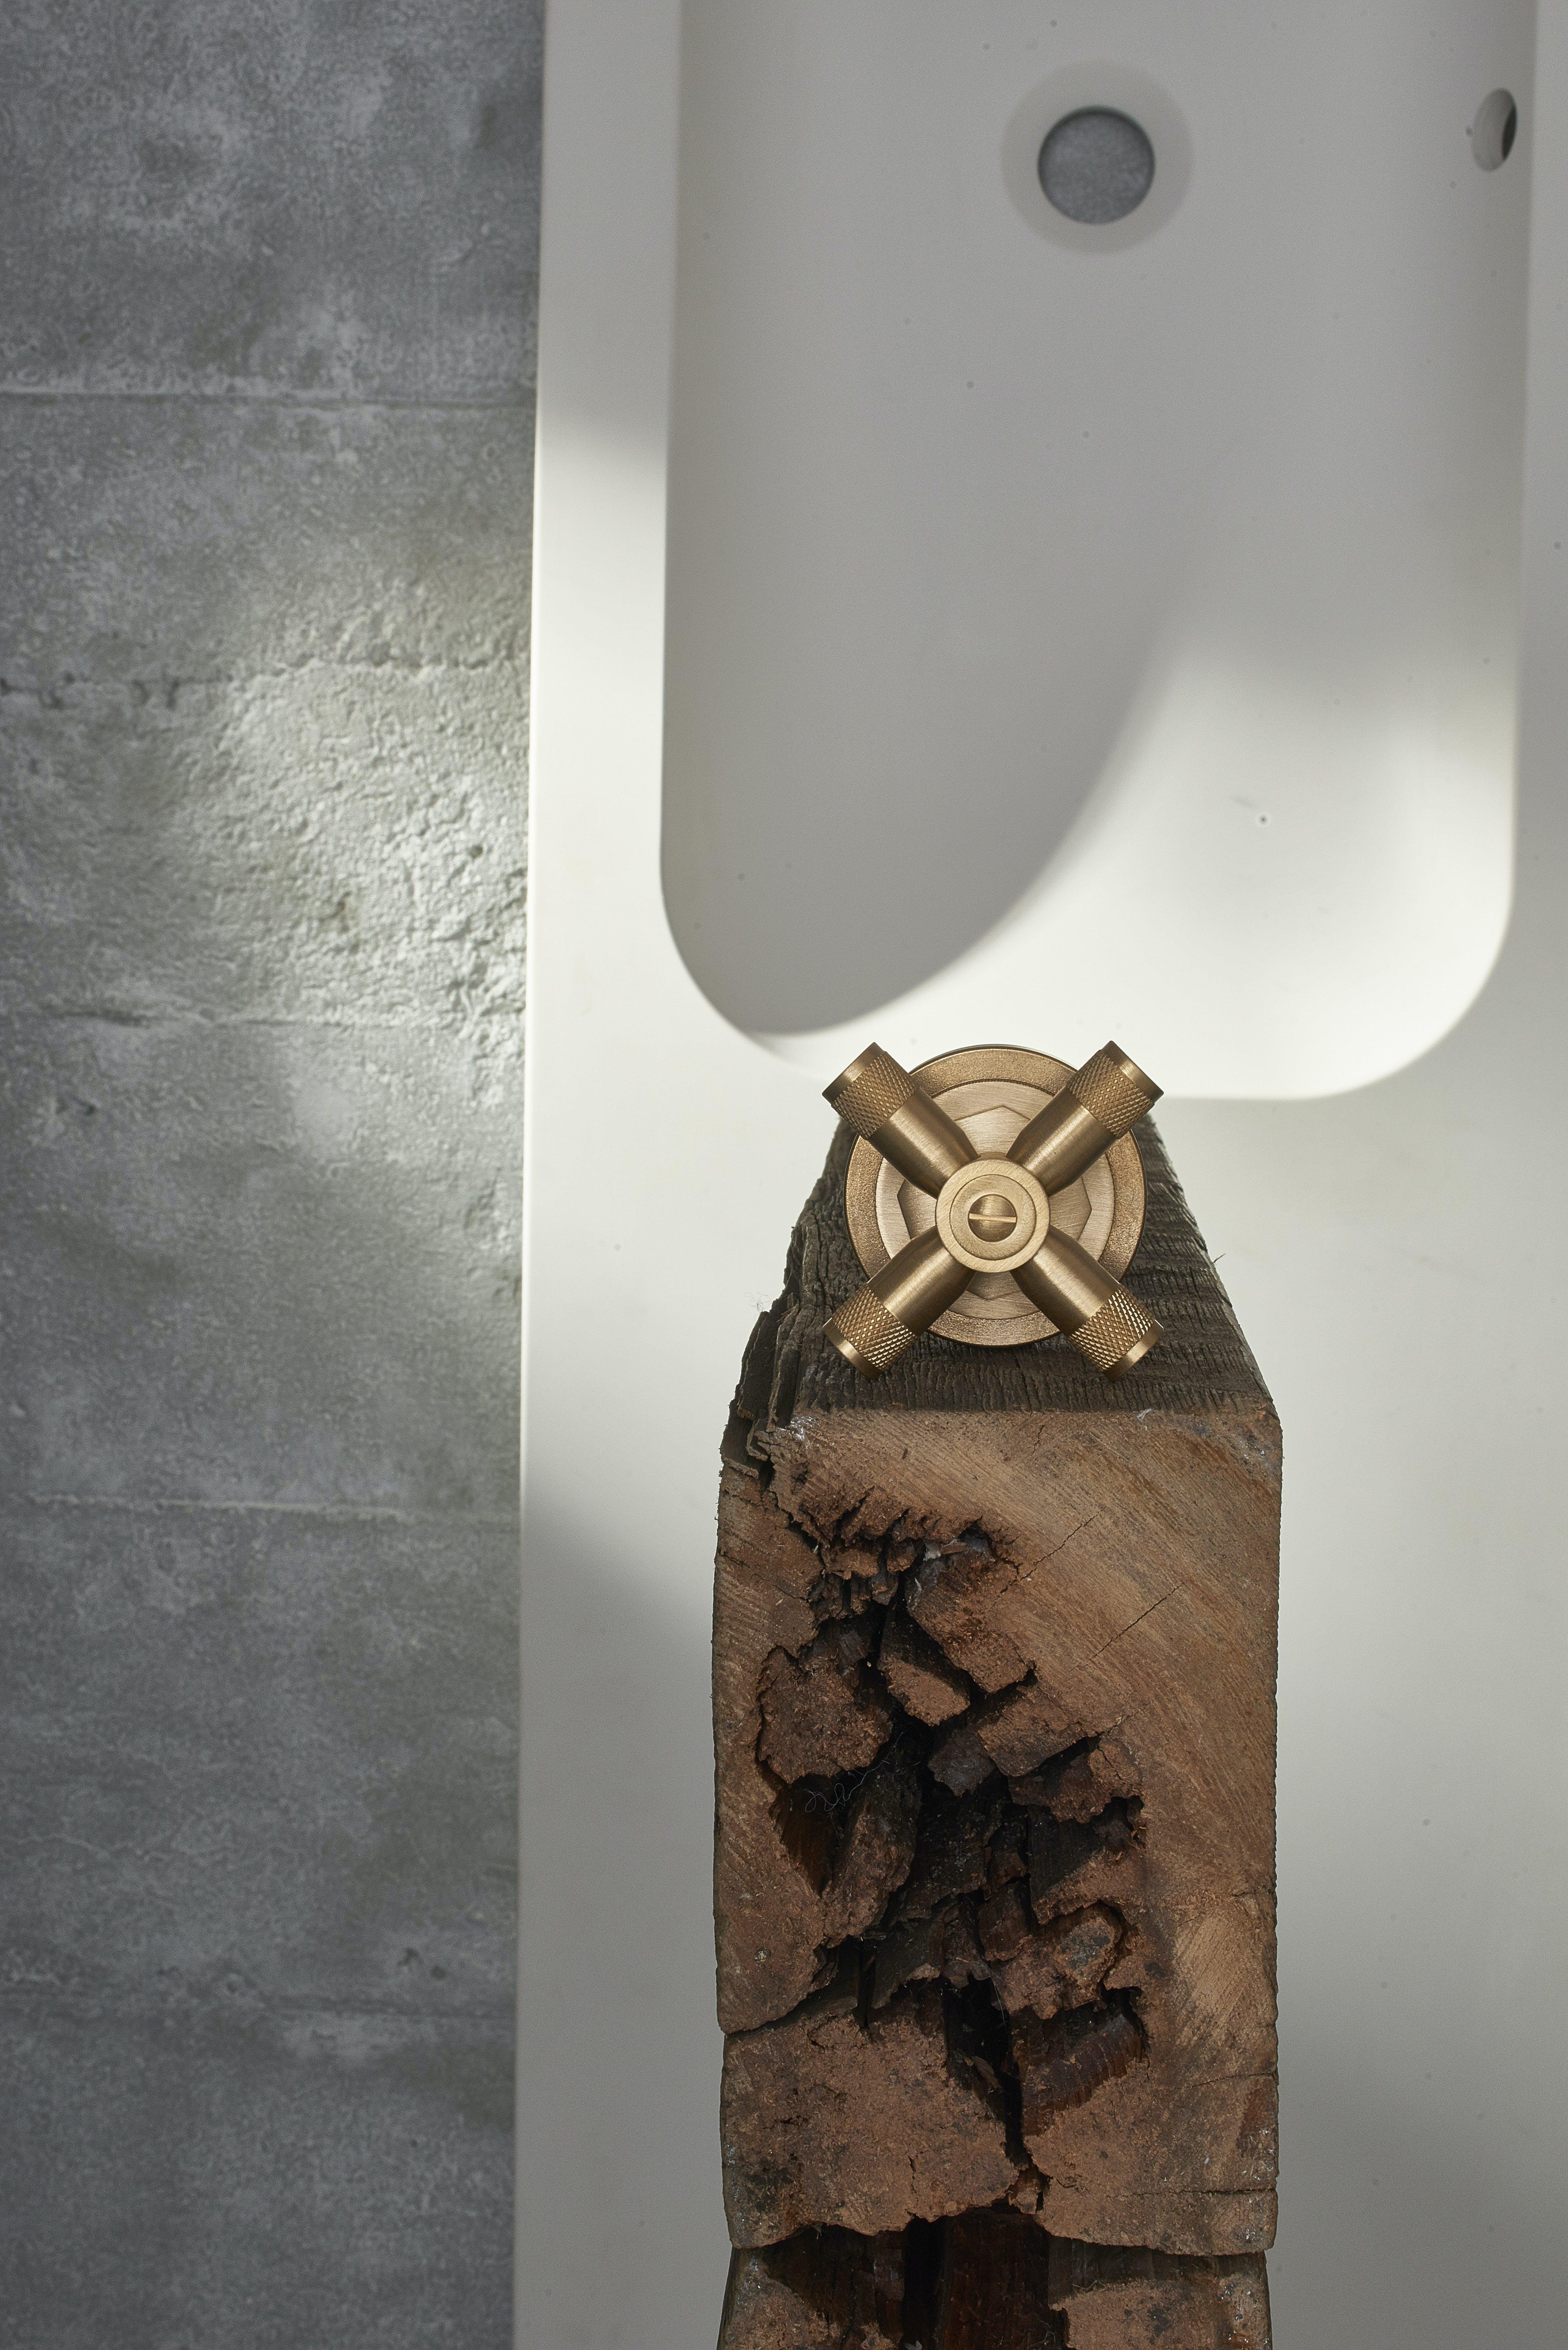 Samuel Heath LMK Industrial Bauhaus inspired cross top tap handle in a natural urban brass finish.